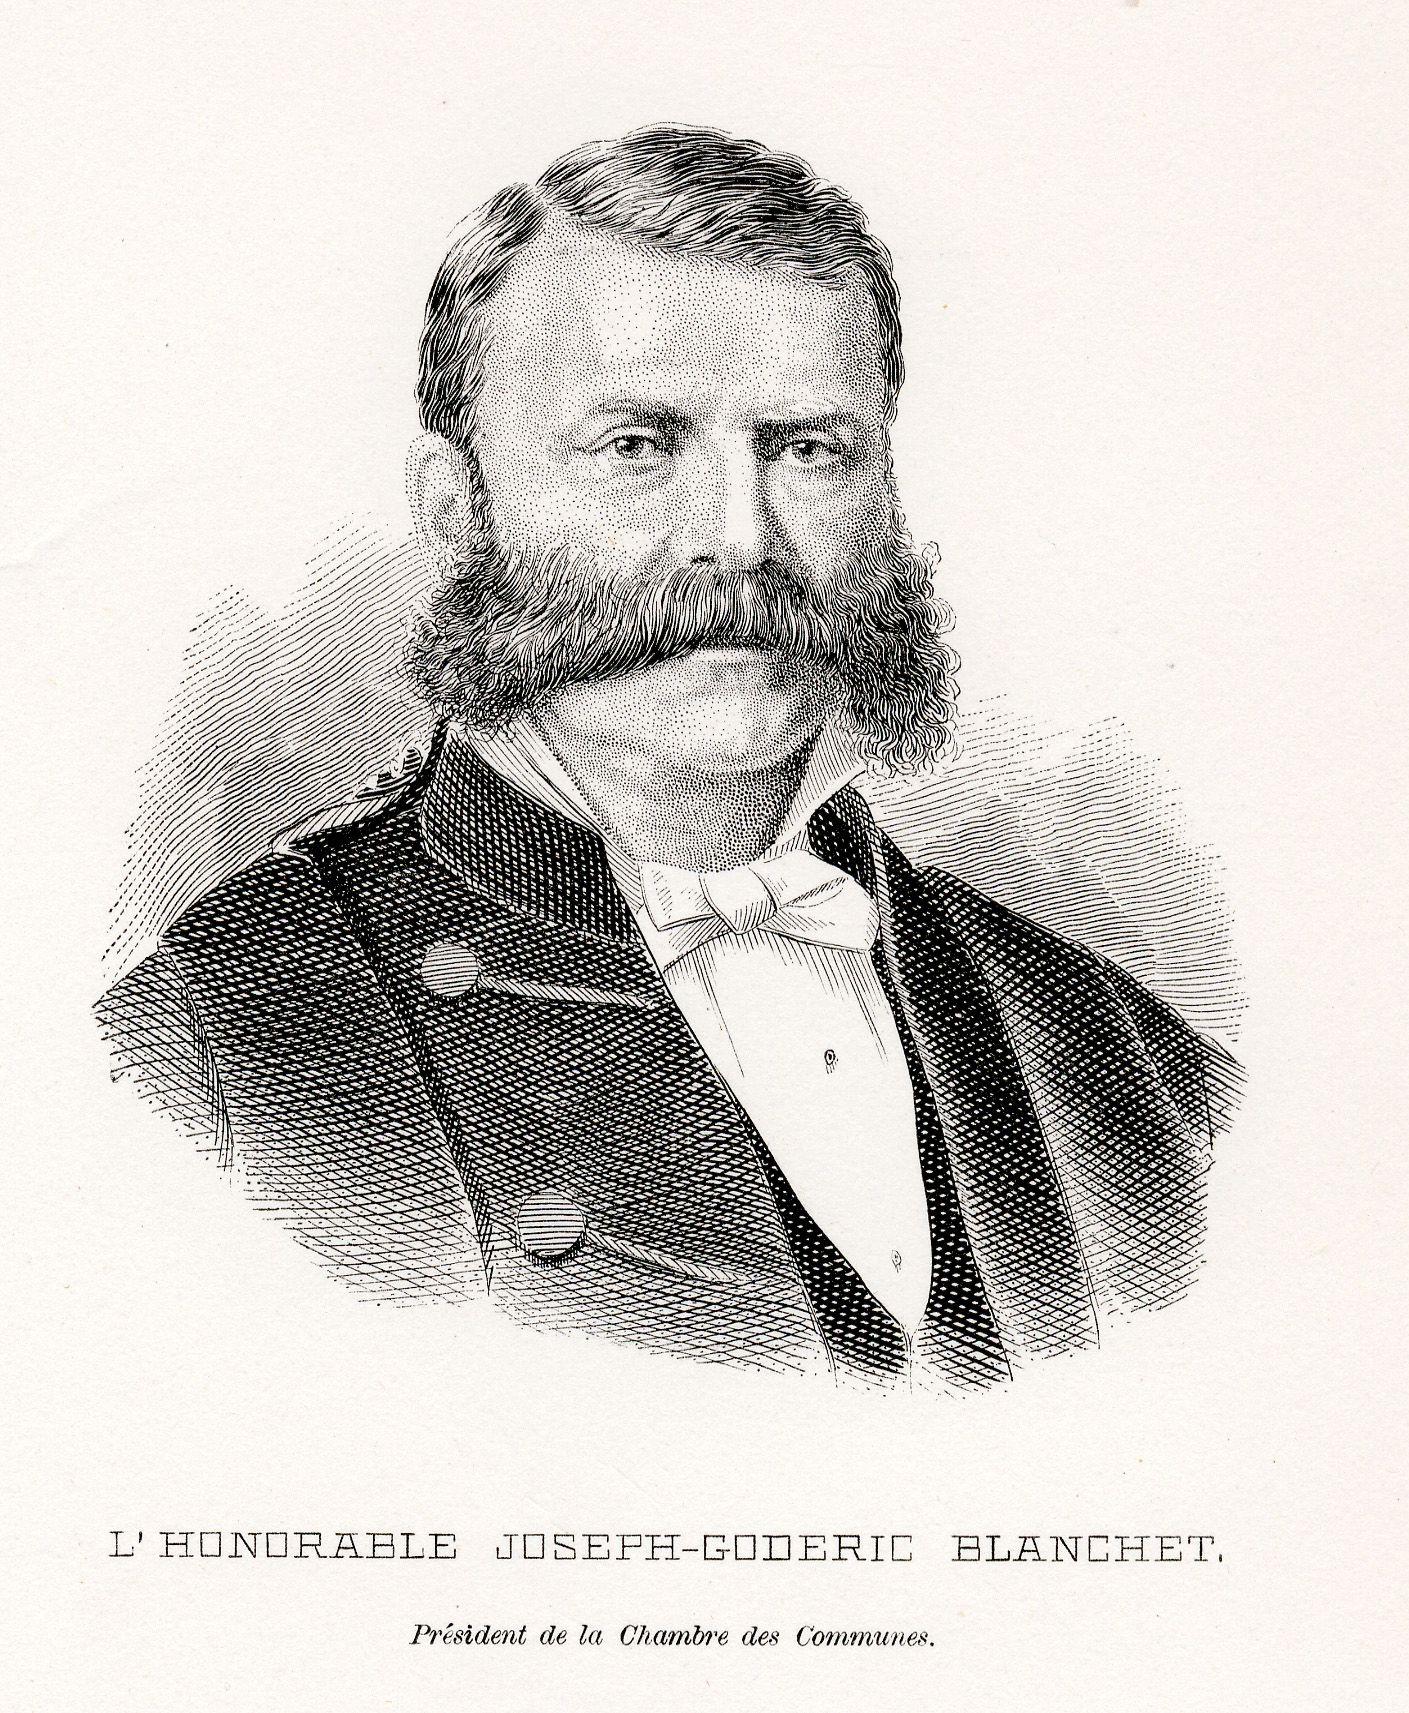 Biography – BLANCHET, JOSEPH-GODRIC – Volume XI (1881-1890 ... Joseph